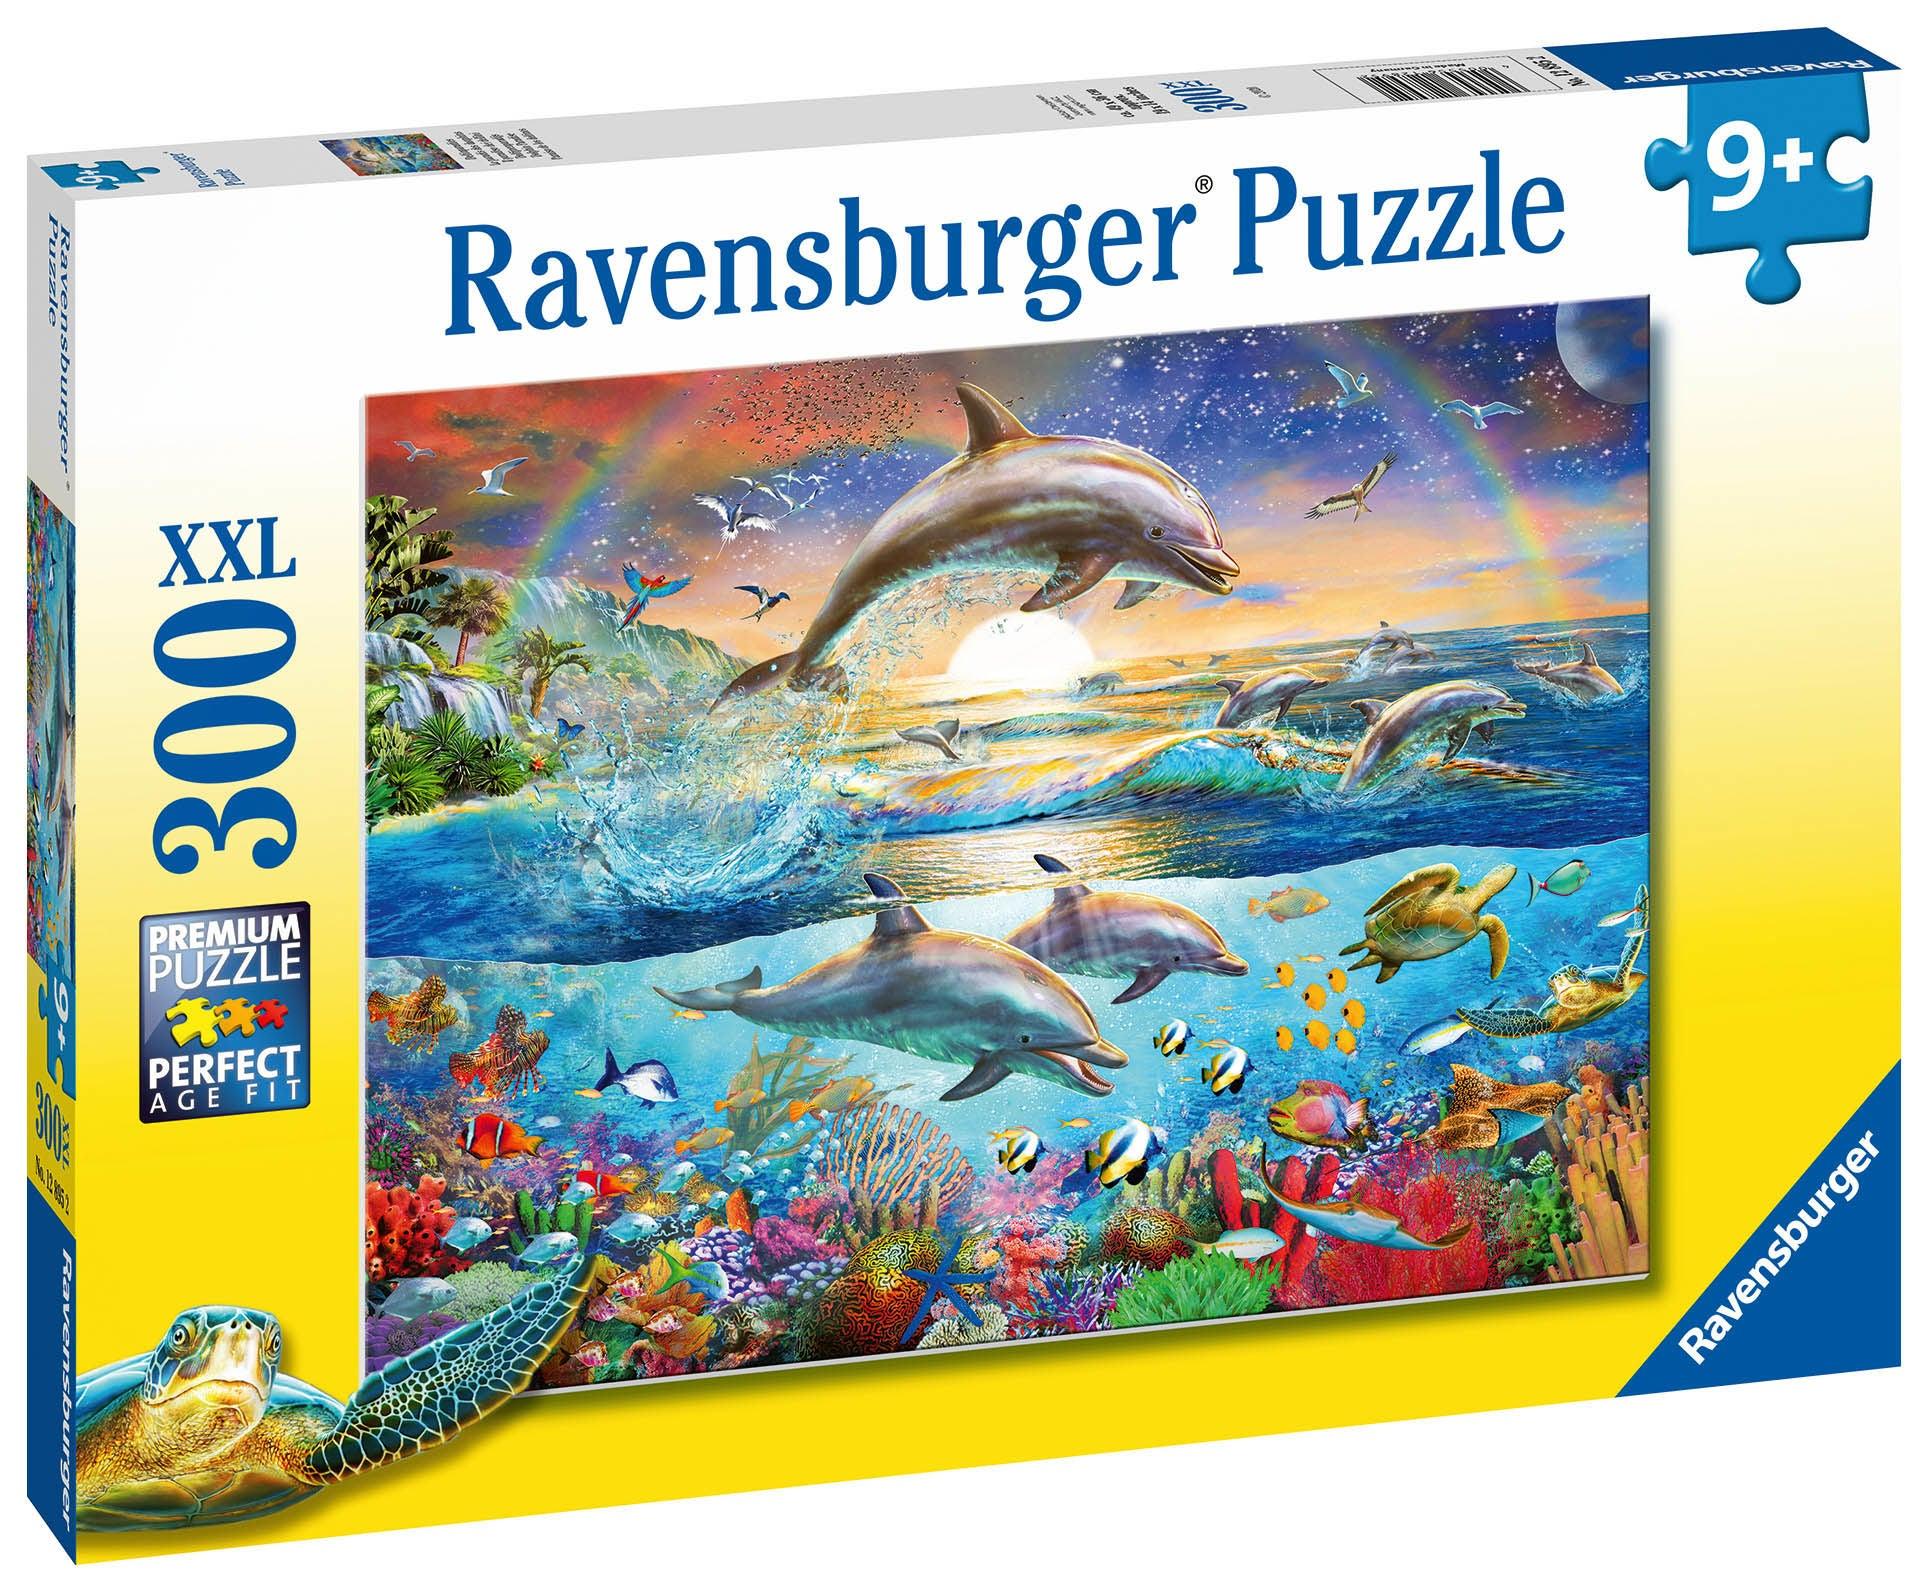 Ravensburger Pussel Delfinparadis 300 Bitar